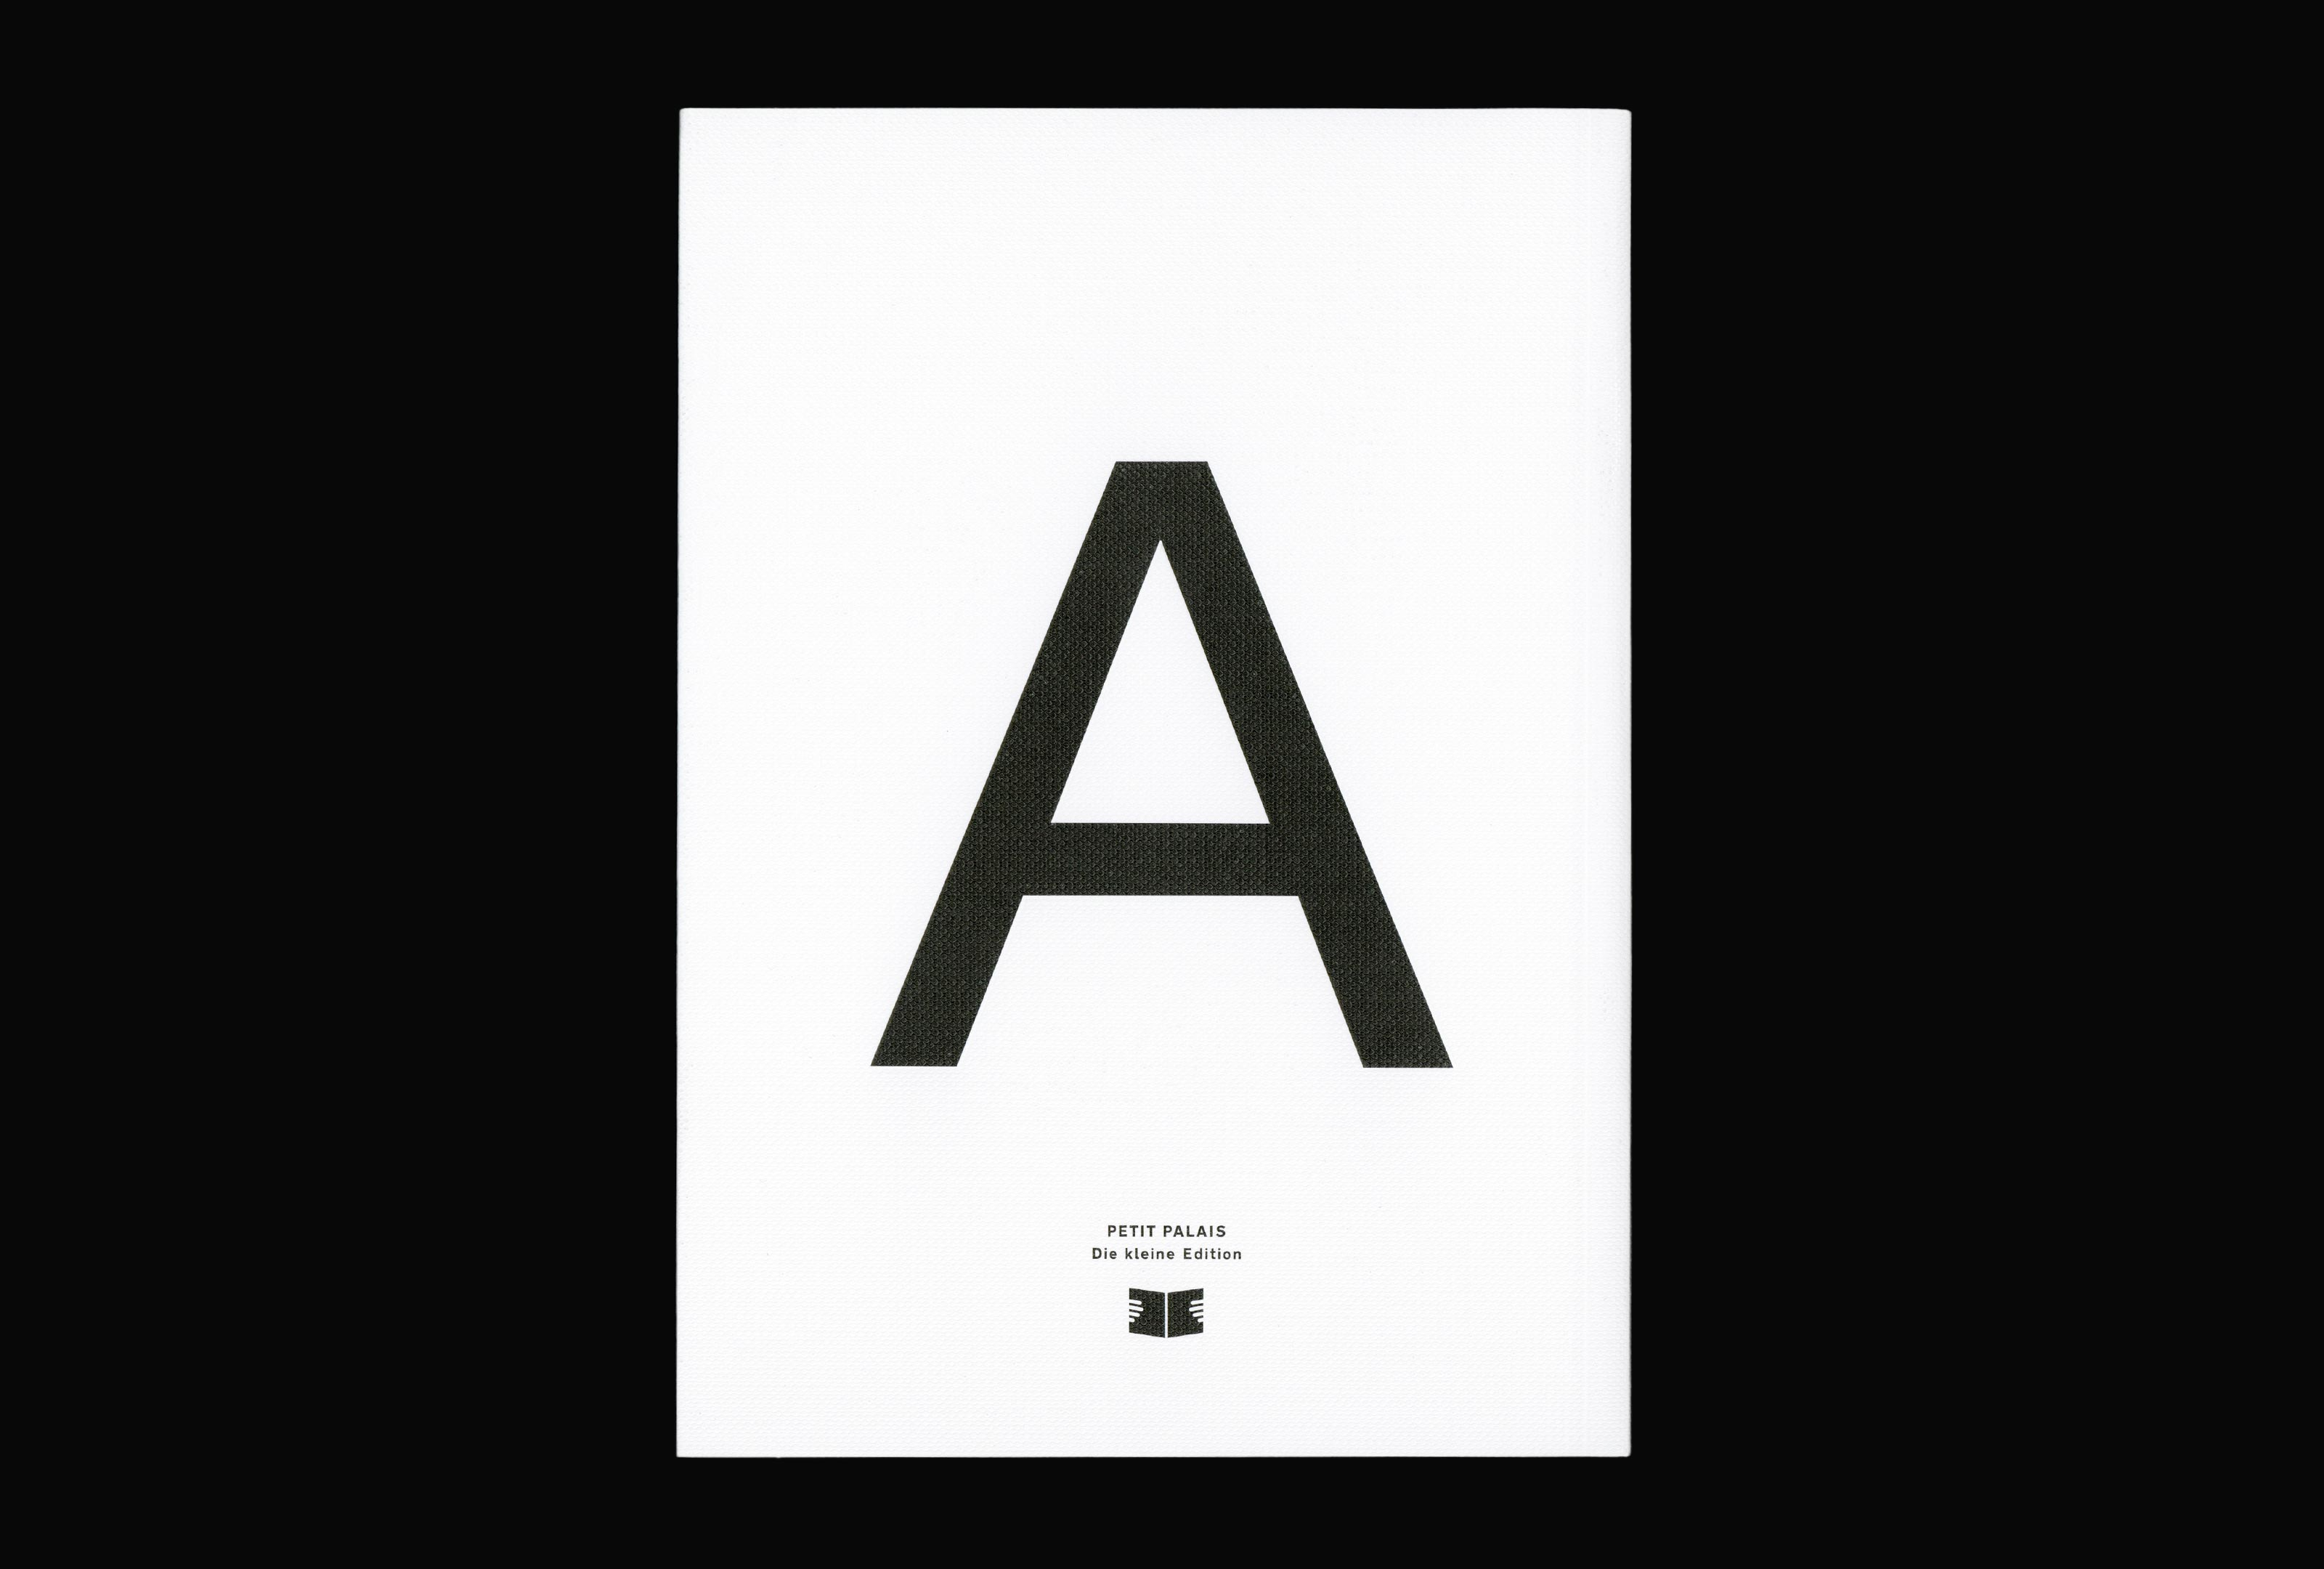 Atelier Pol, Grand Palais, Off Space, ABC, kultur, index, publication, editorial design, bern, switzerland, black and white